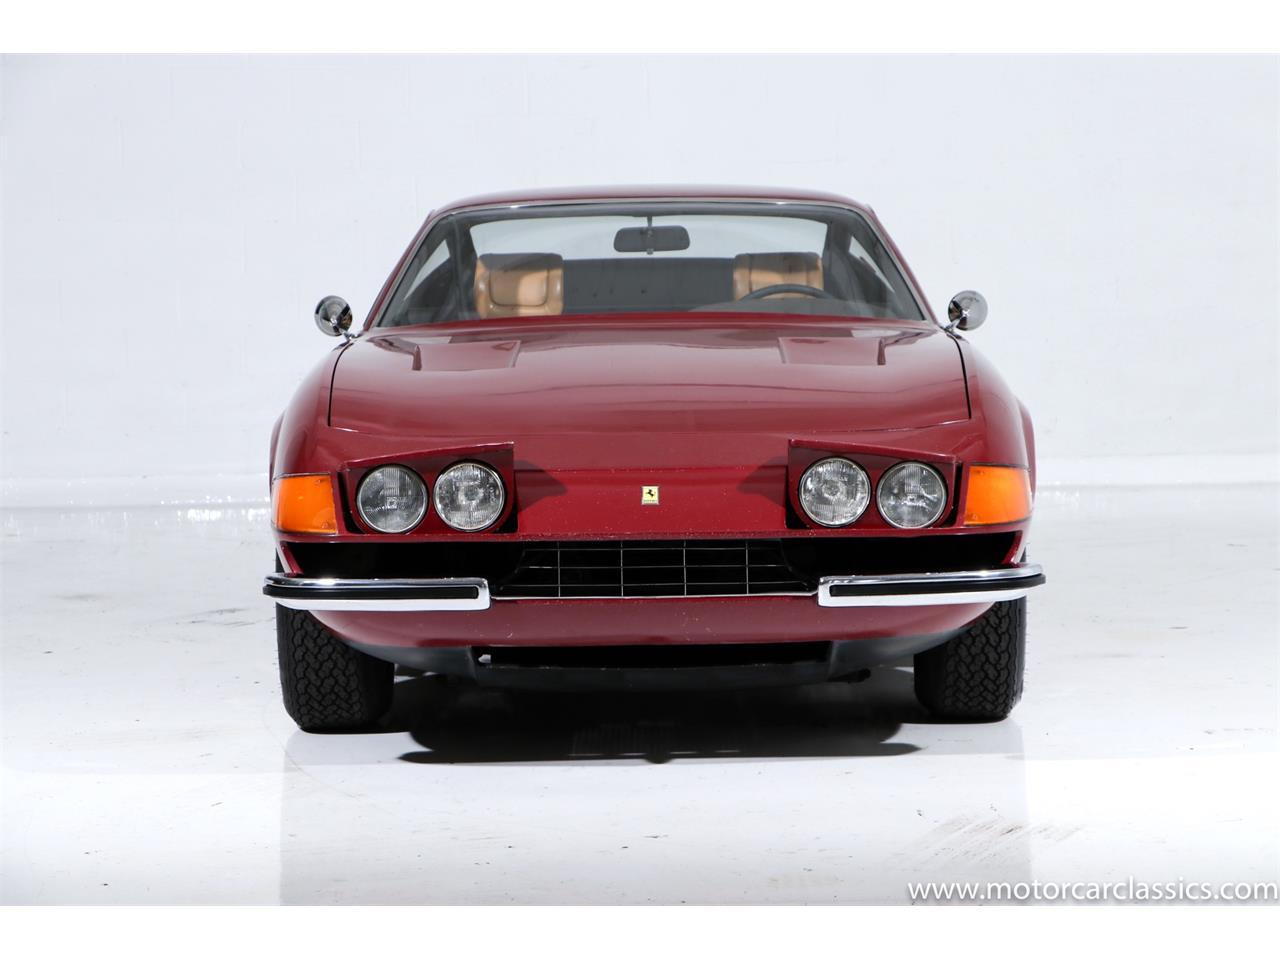 1973 Ferrari 365 GTB/4 (CC-1295353) for sale in Farmingdale, New York